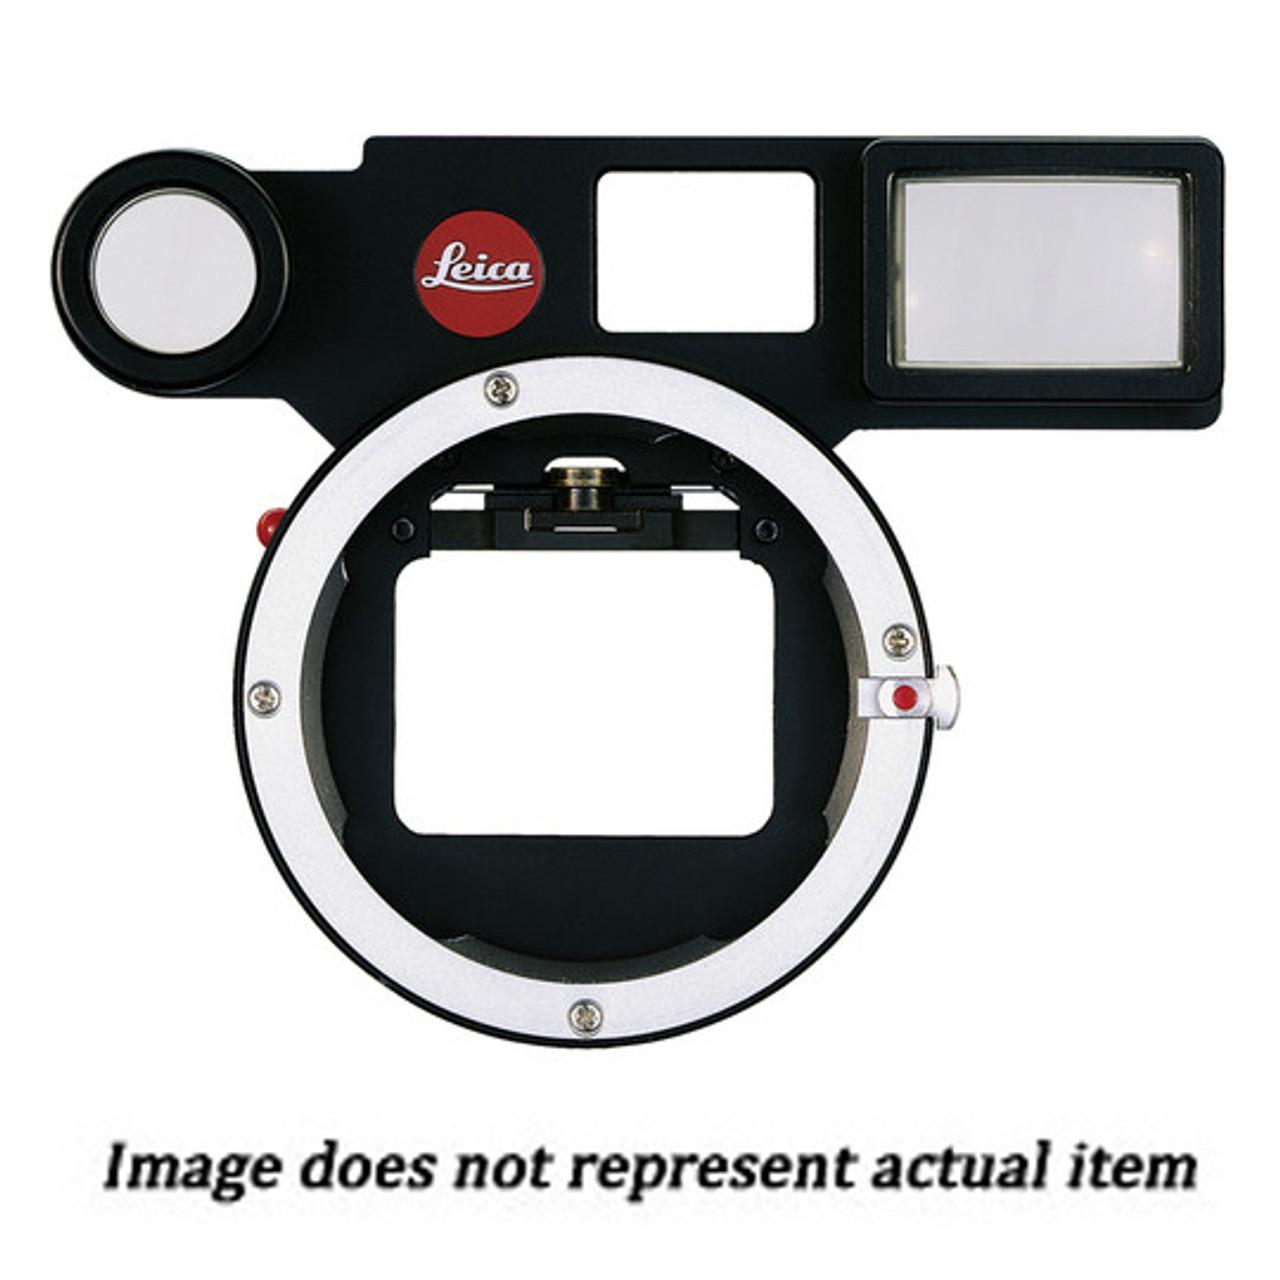 Leica Macro Adapter M for 90mm f/4 Macro Lens (USED)